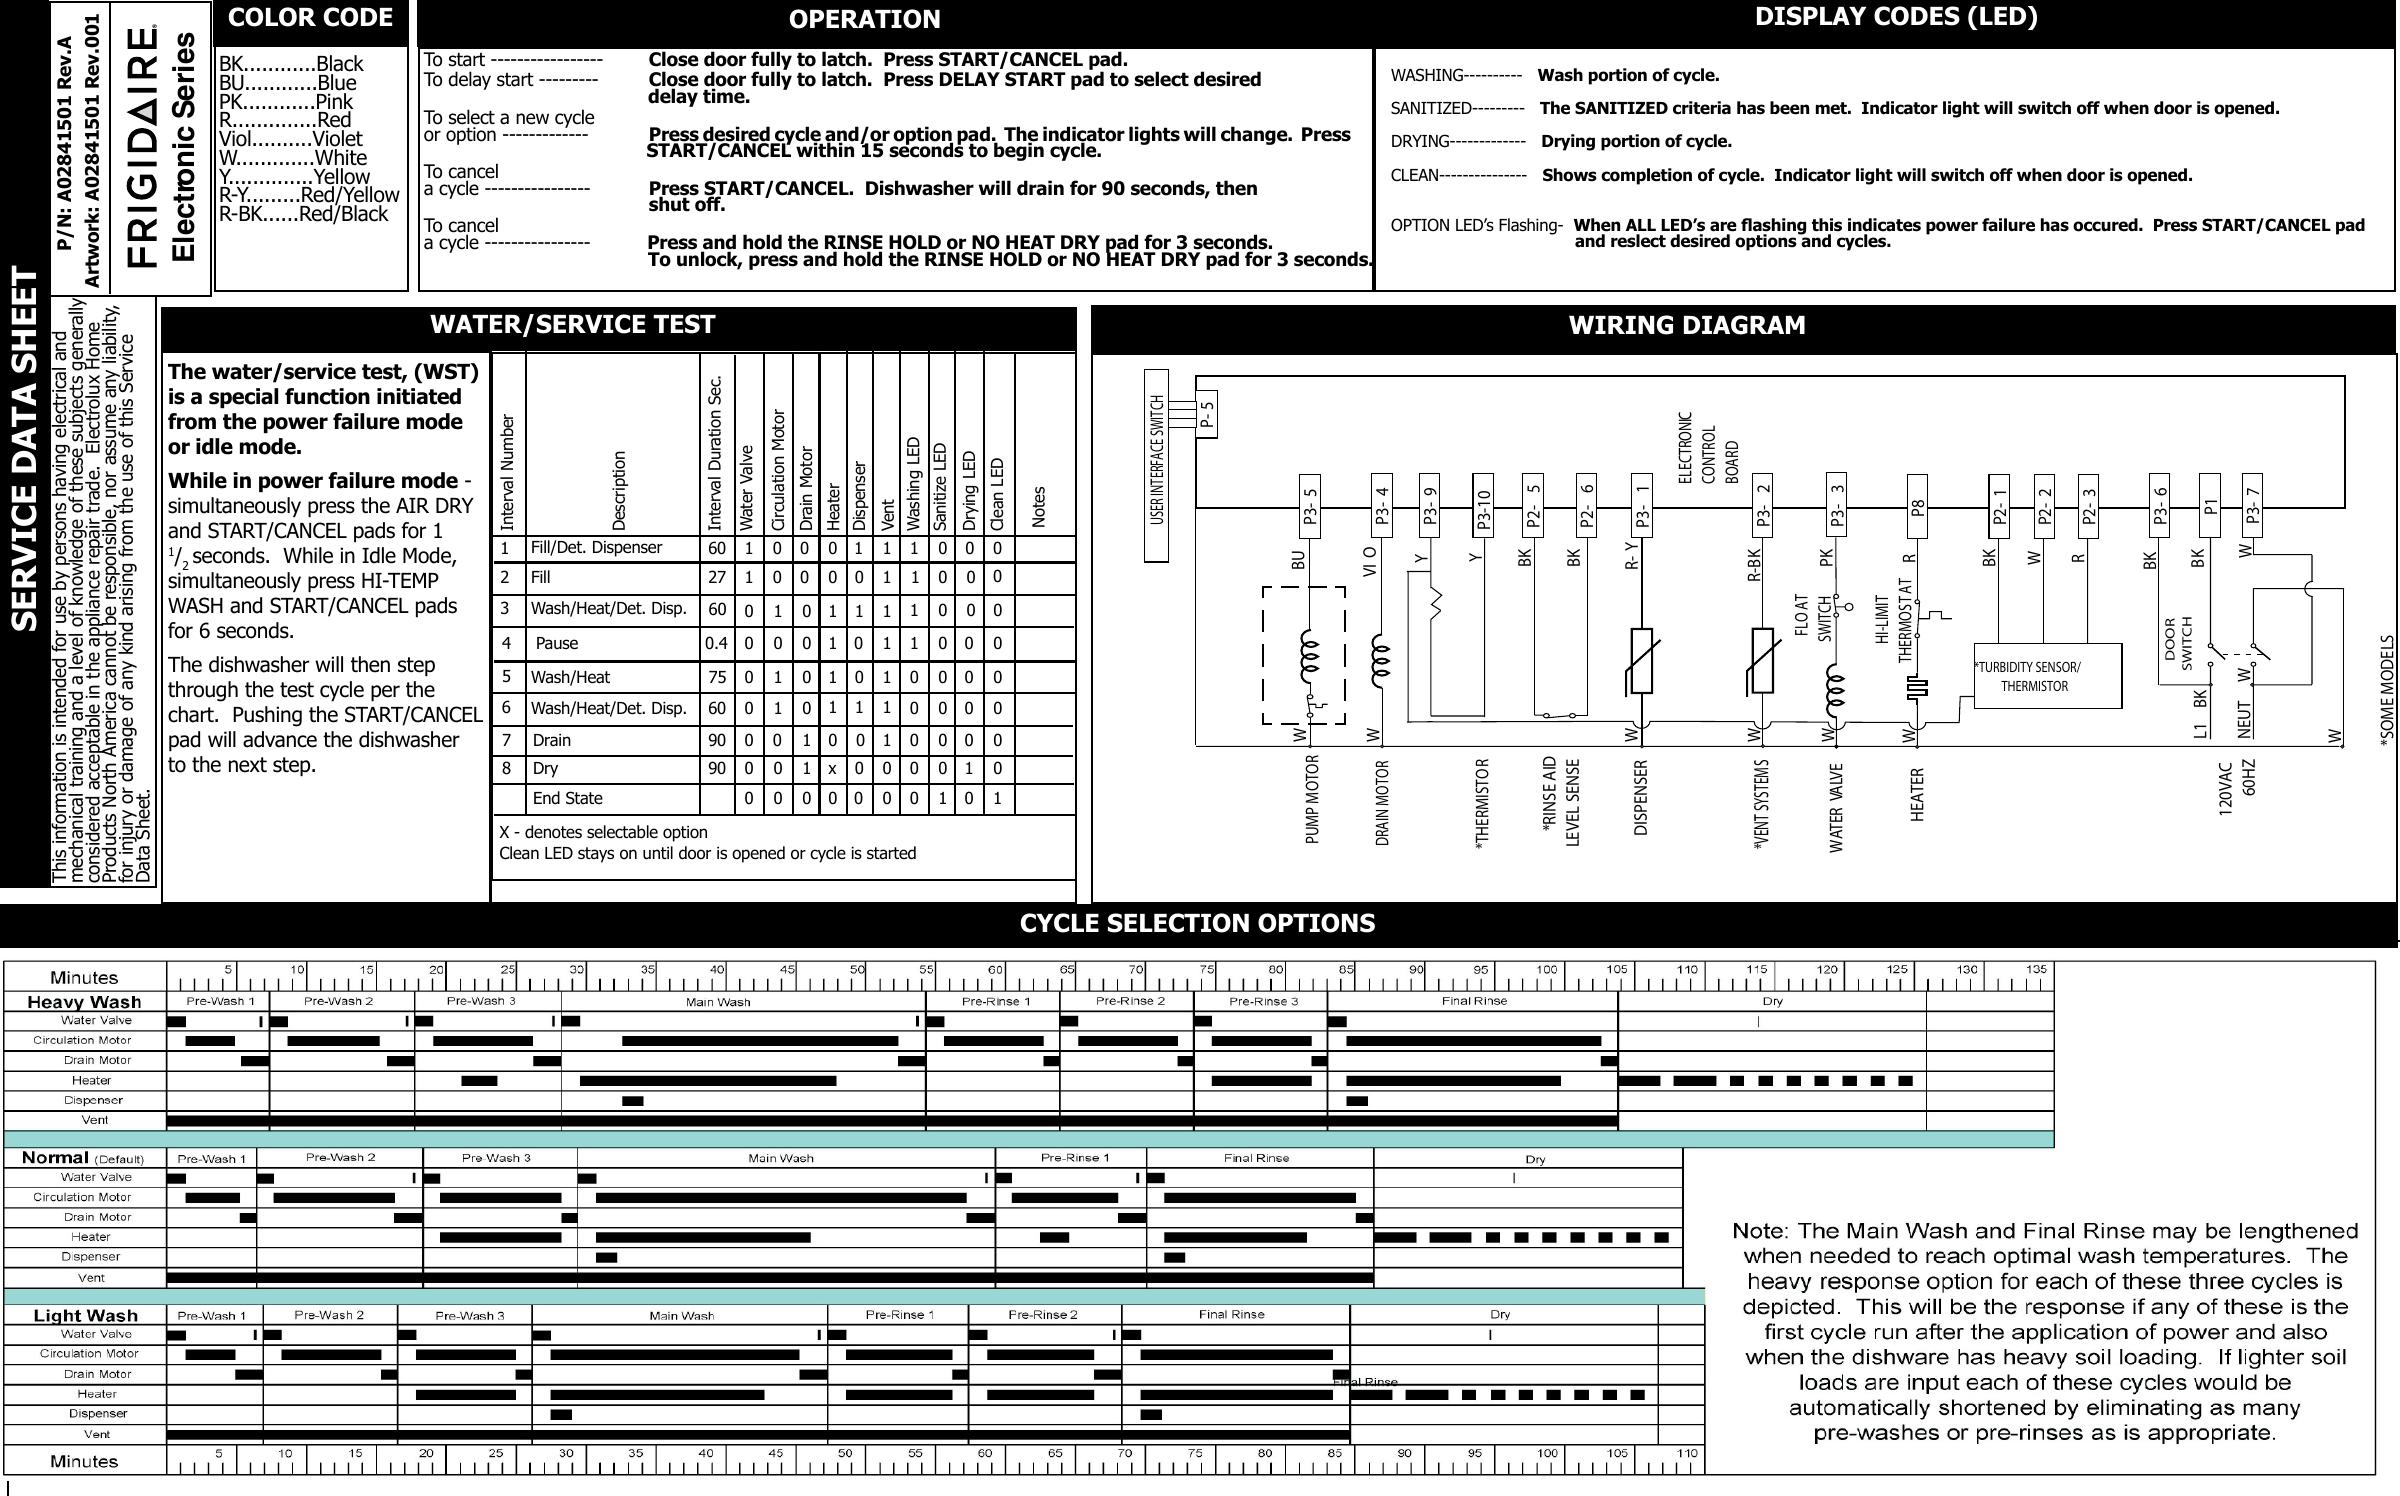 Attractive Burner Wiring Diagram Thermistor Gift - Wiring Diagram ...